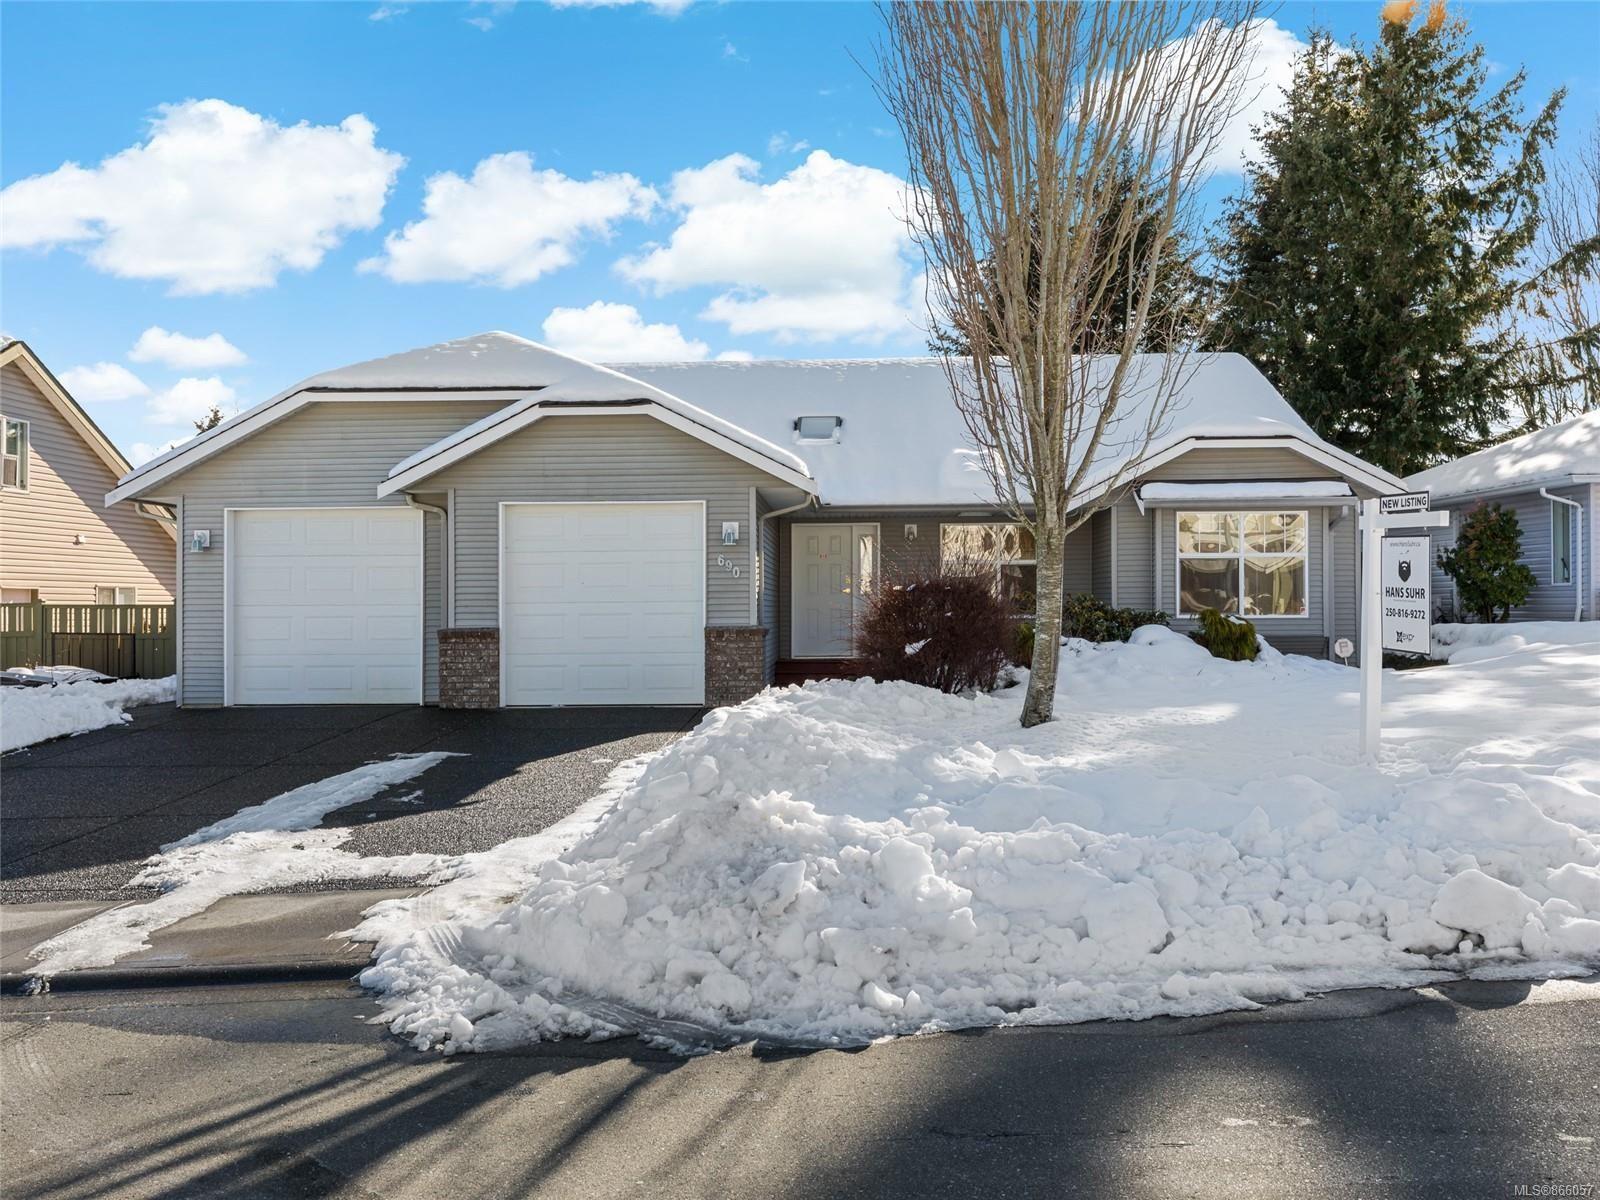 Main Photo: 690 Moralee Dr in Comox: CV Comox (Town of) House for sale (Comox Valley)  : MLS®# 866057